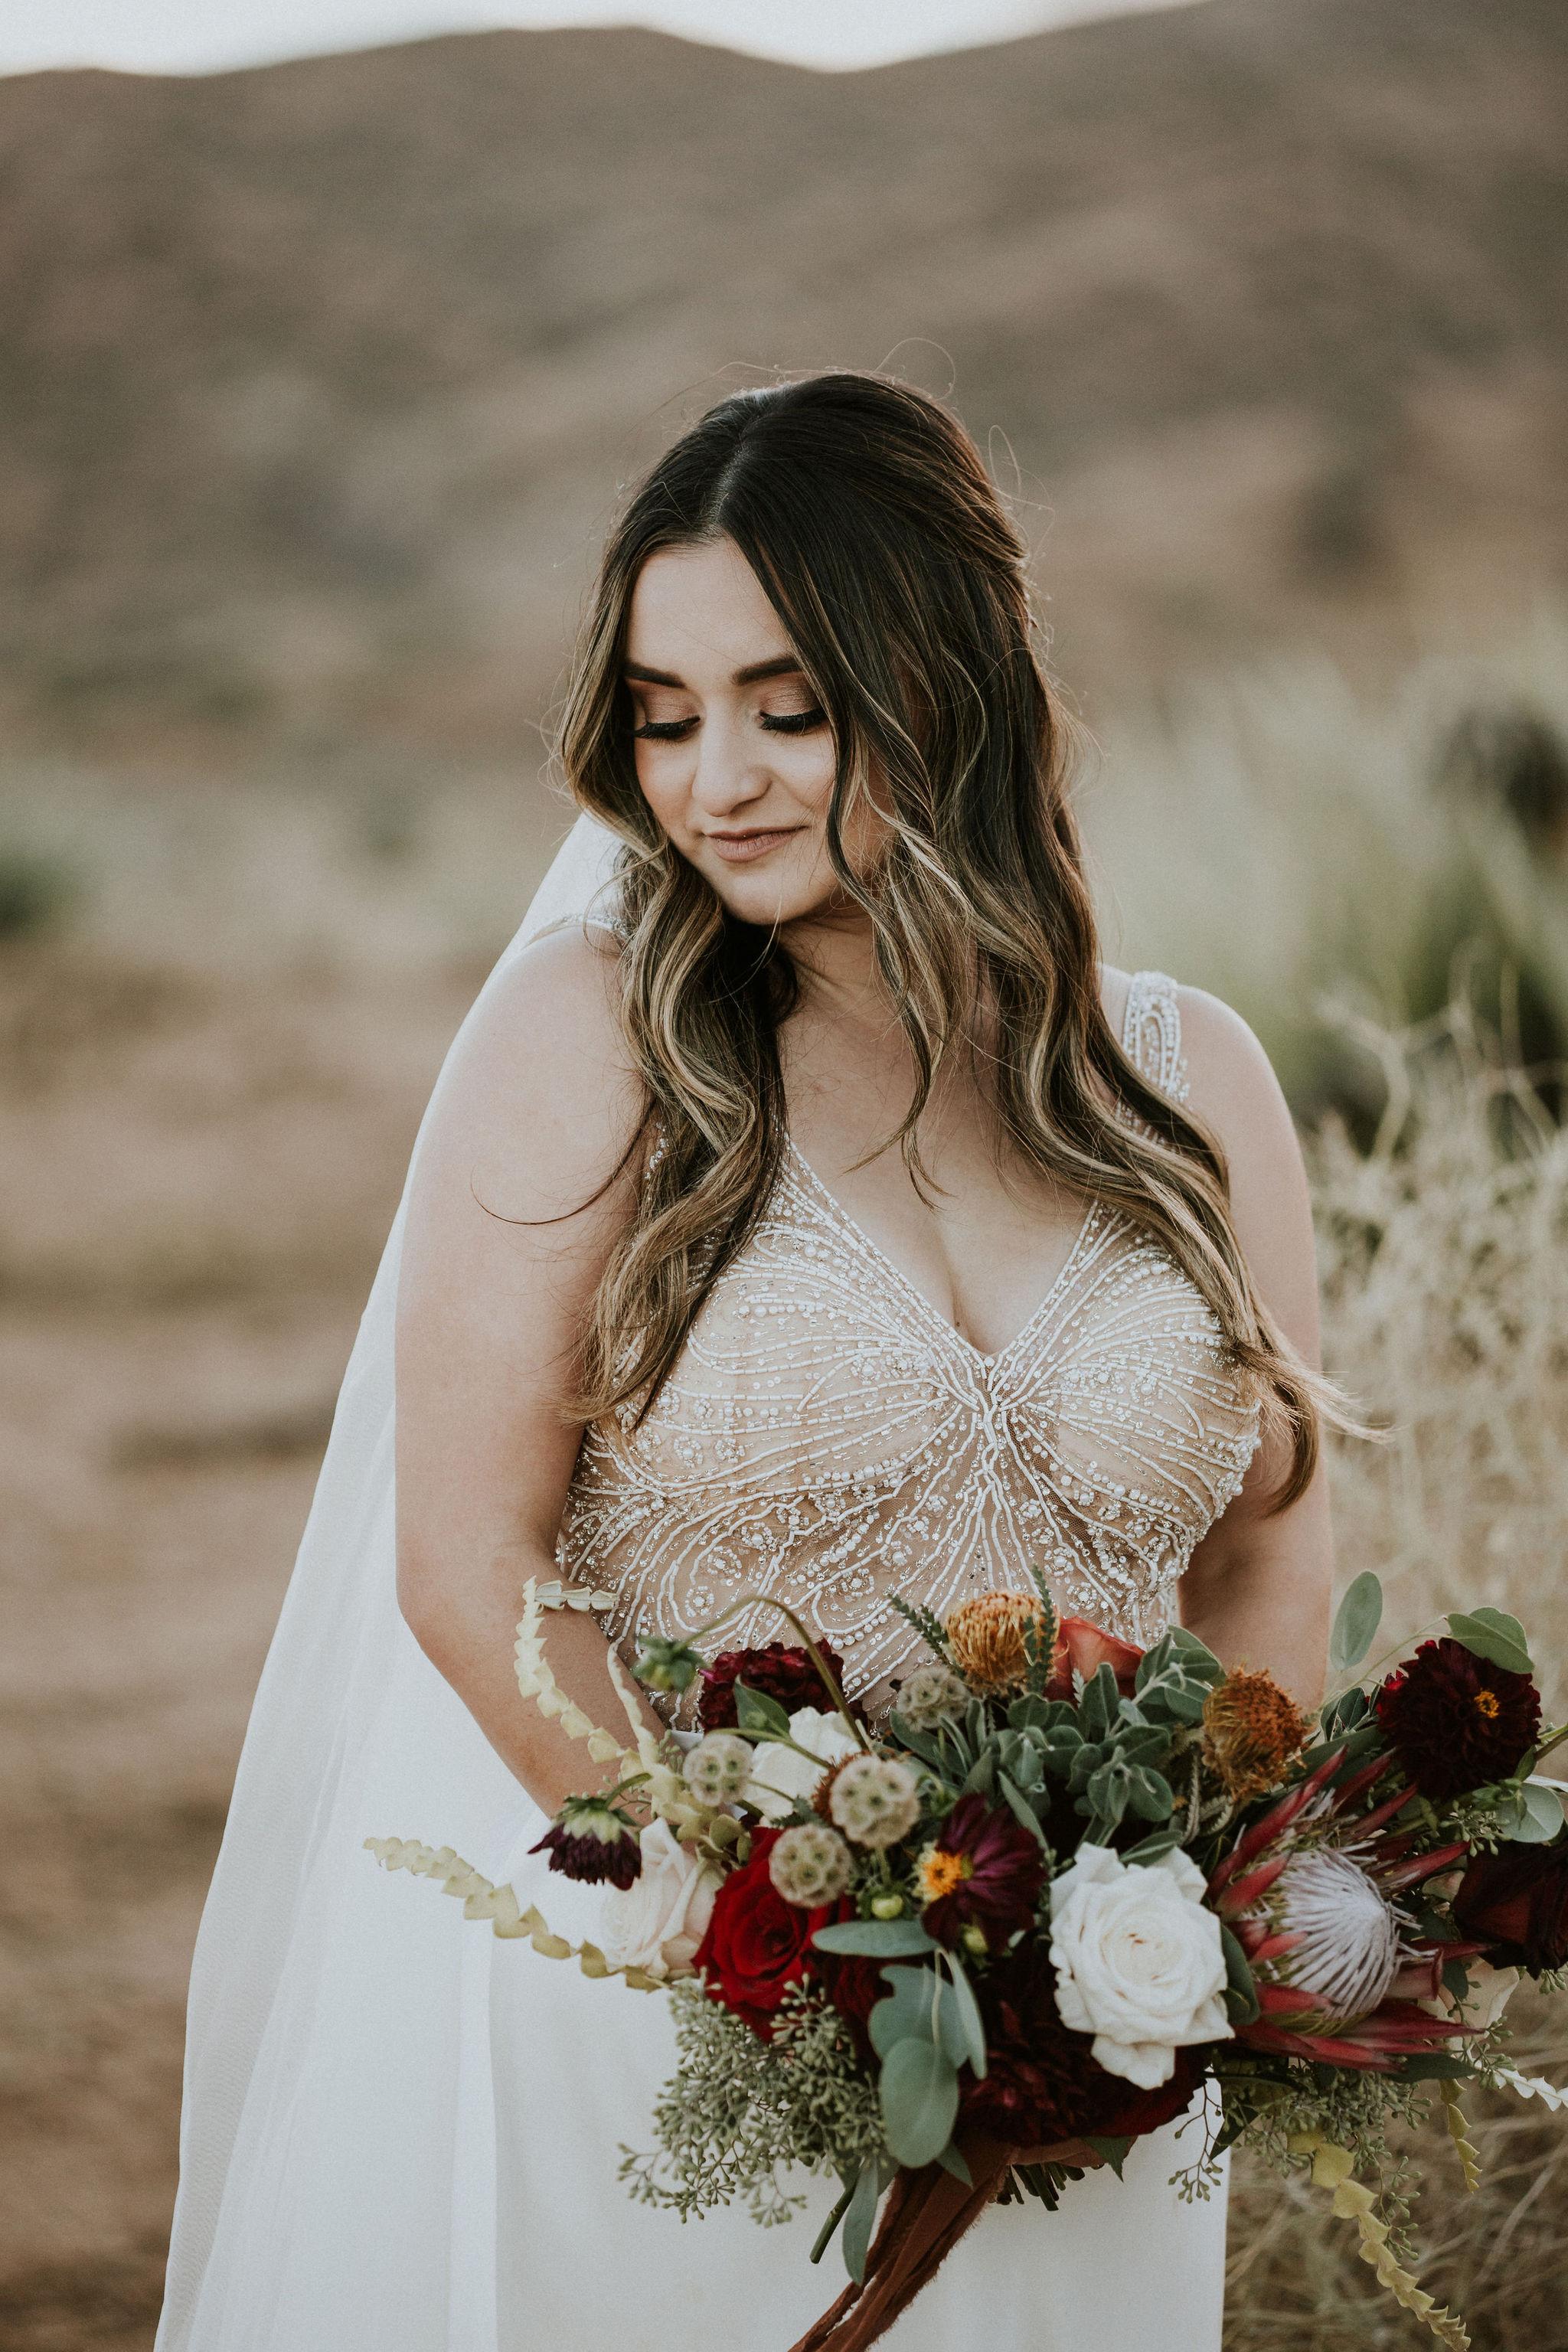 RimrockRanch-JoshuaTree-Wedding-Jami-Laree-682.jpg